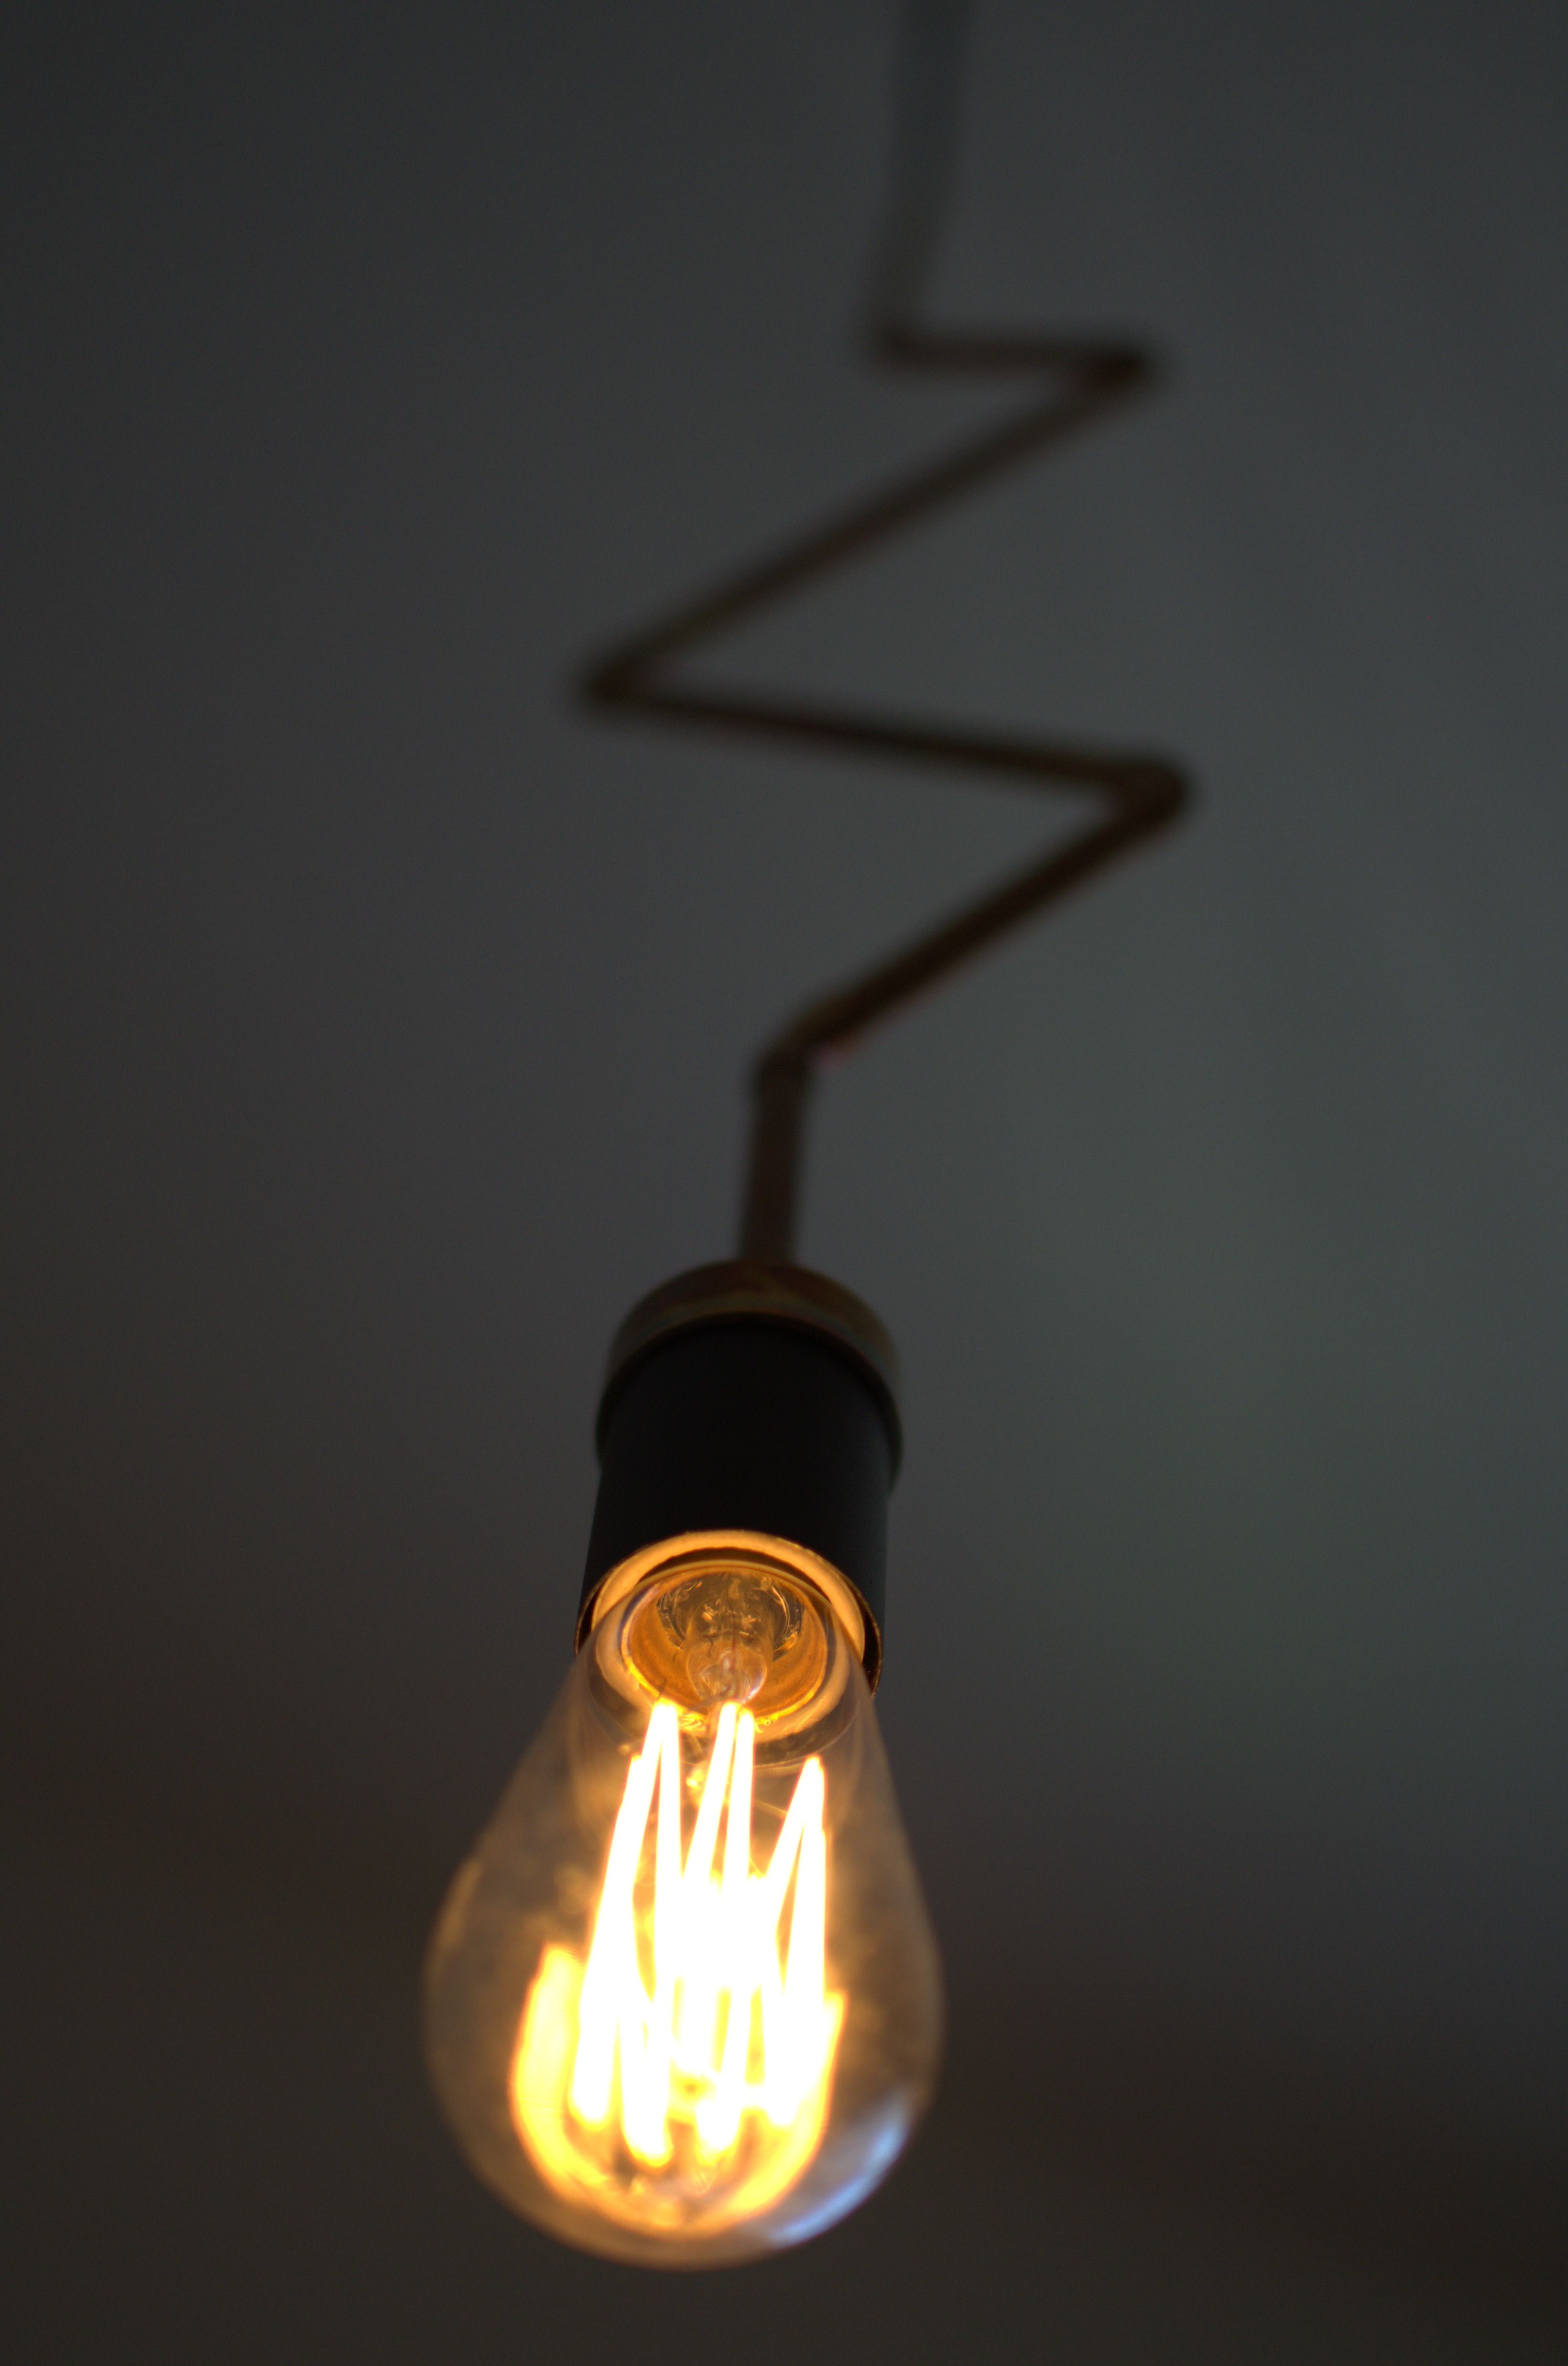 Plug In Pendant Light Industrial Lighting Geometric Copper Zig Zag Hanging Edison Lamp Chandelier Unique Lig Unique Items Products Light Light Fixtures